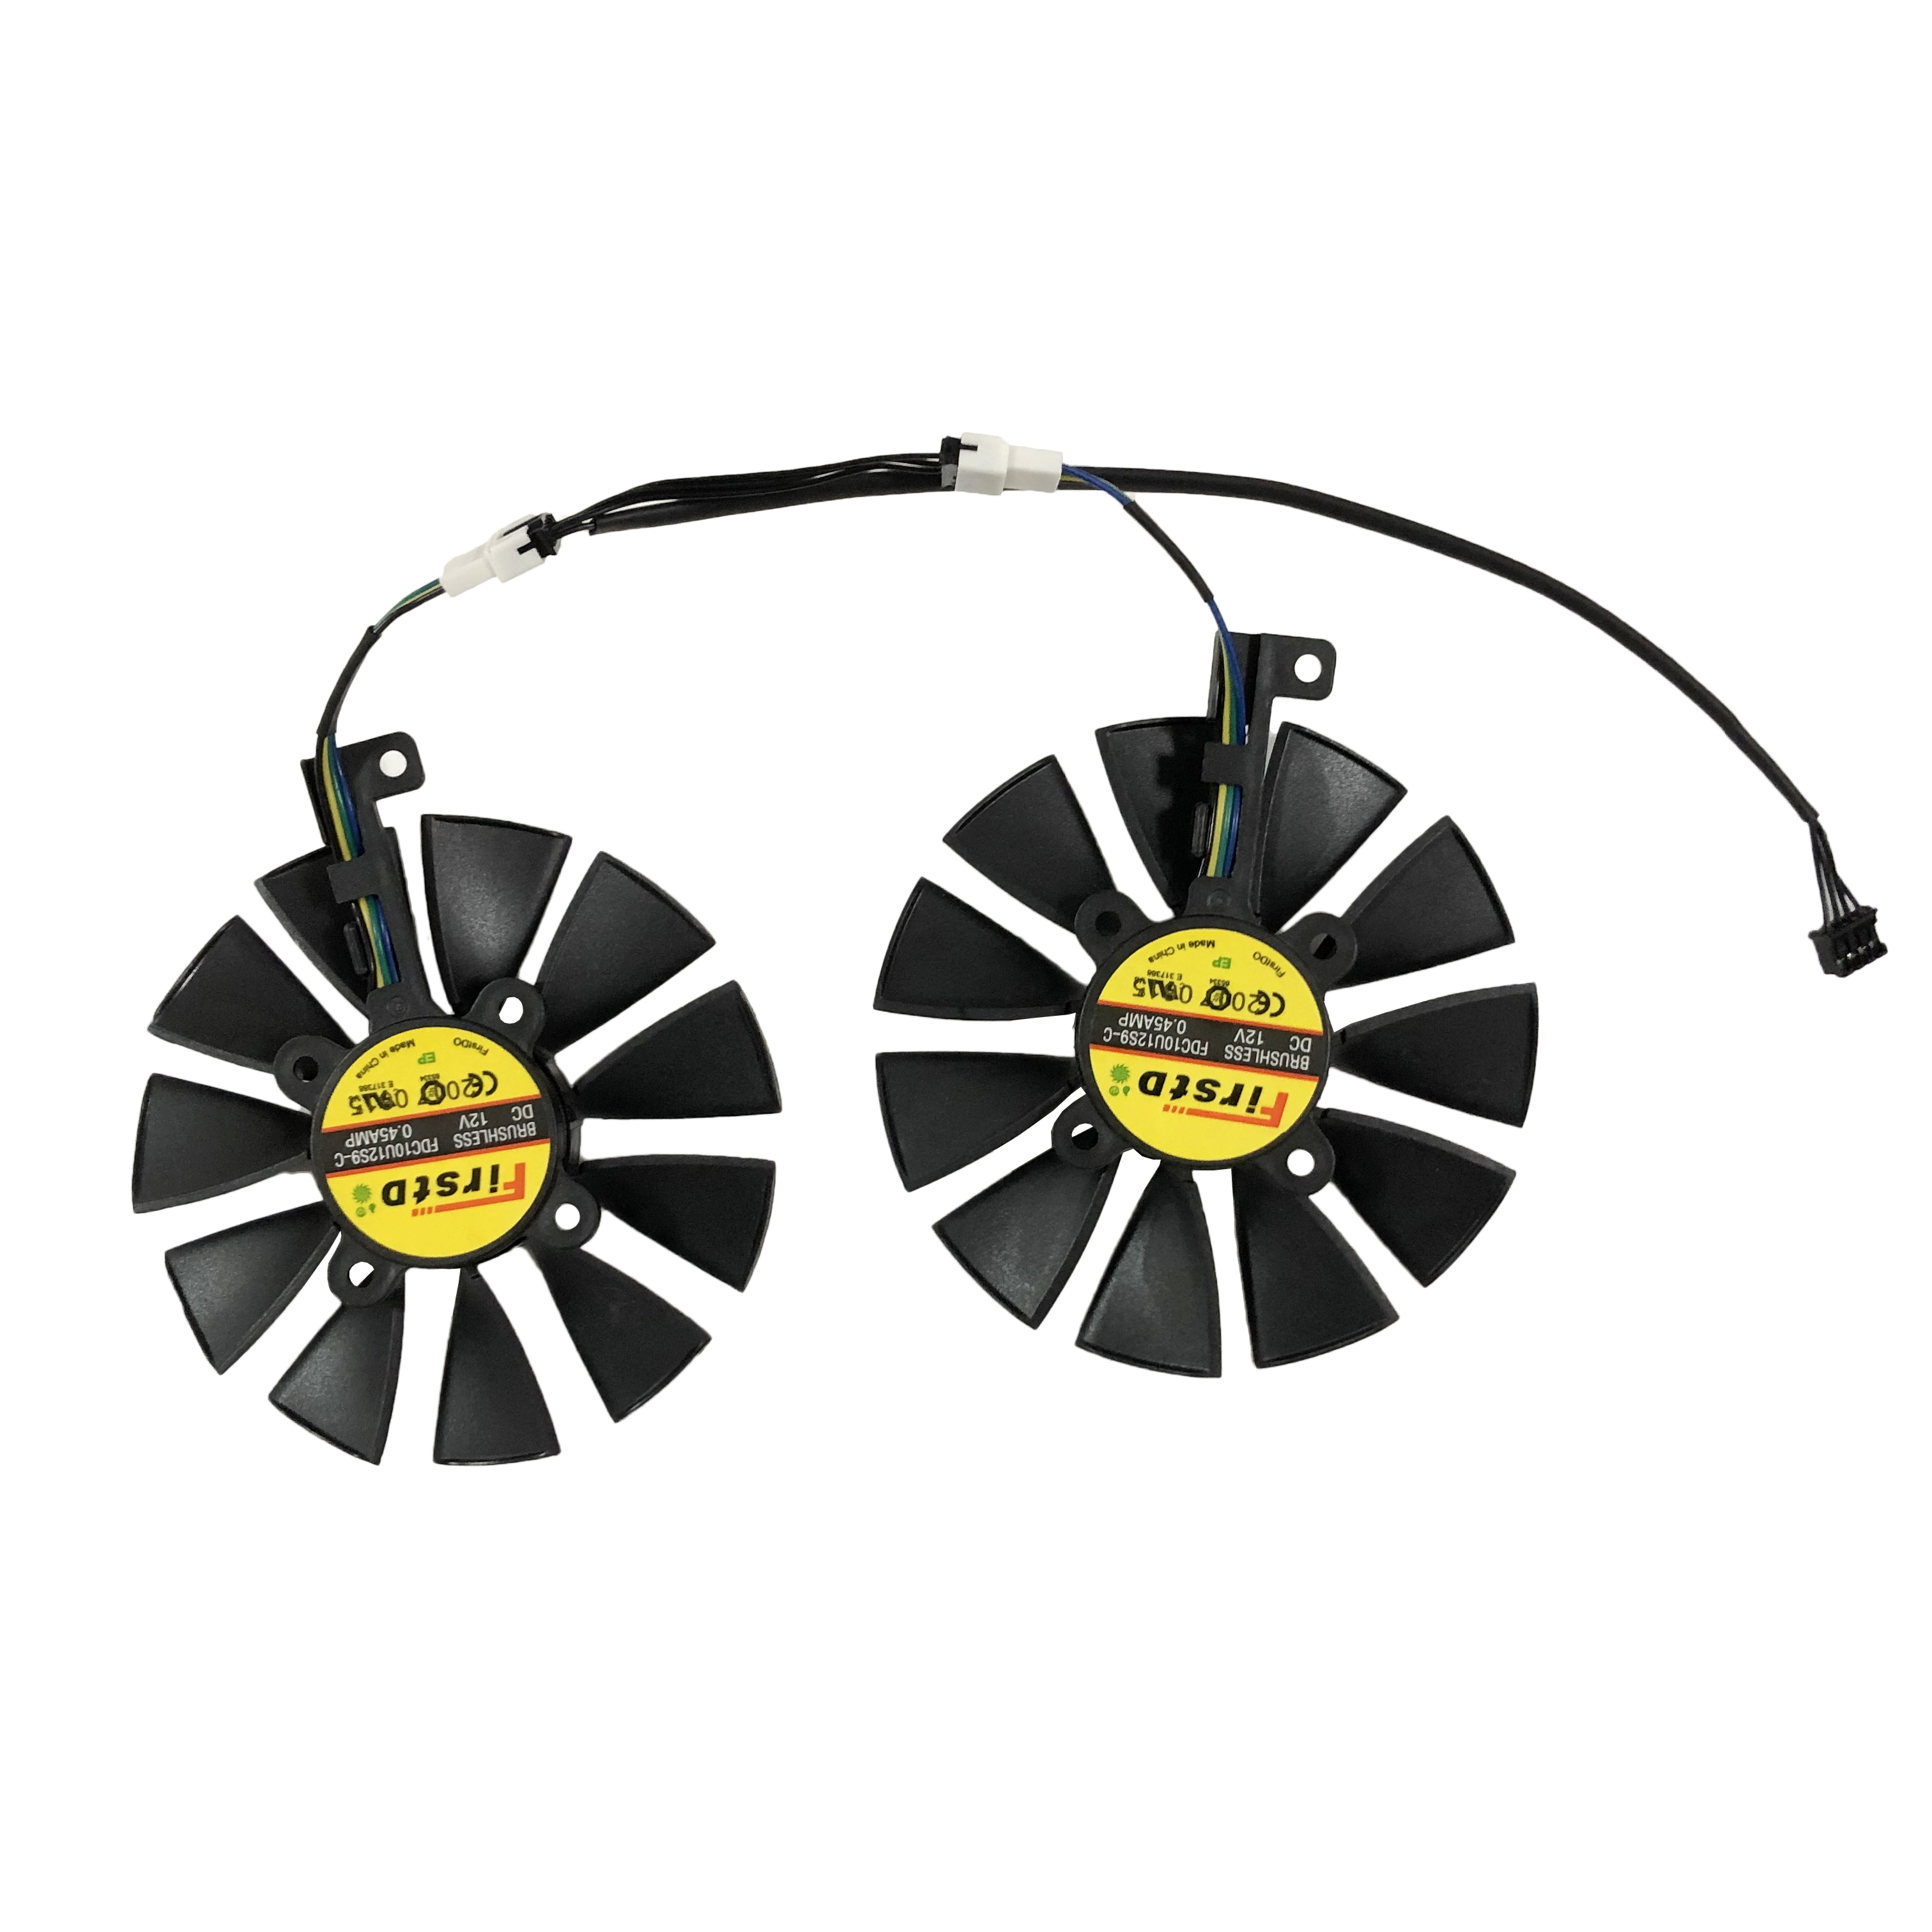 2 pçs/set 87mm FDC10U12S9-C EX-RX570 GTX 1060/1070 DUAL GPU Cooler Fan Para ASUS AREZ-EX-RX570-8G/4G Vídeo Placa Gráfica Arrefecimento